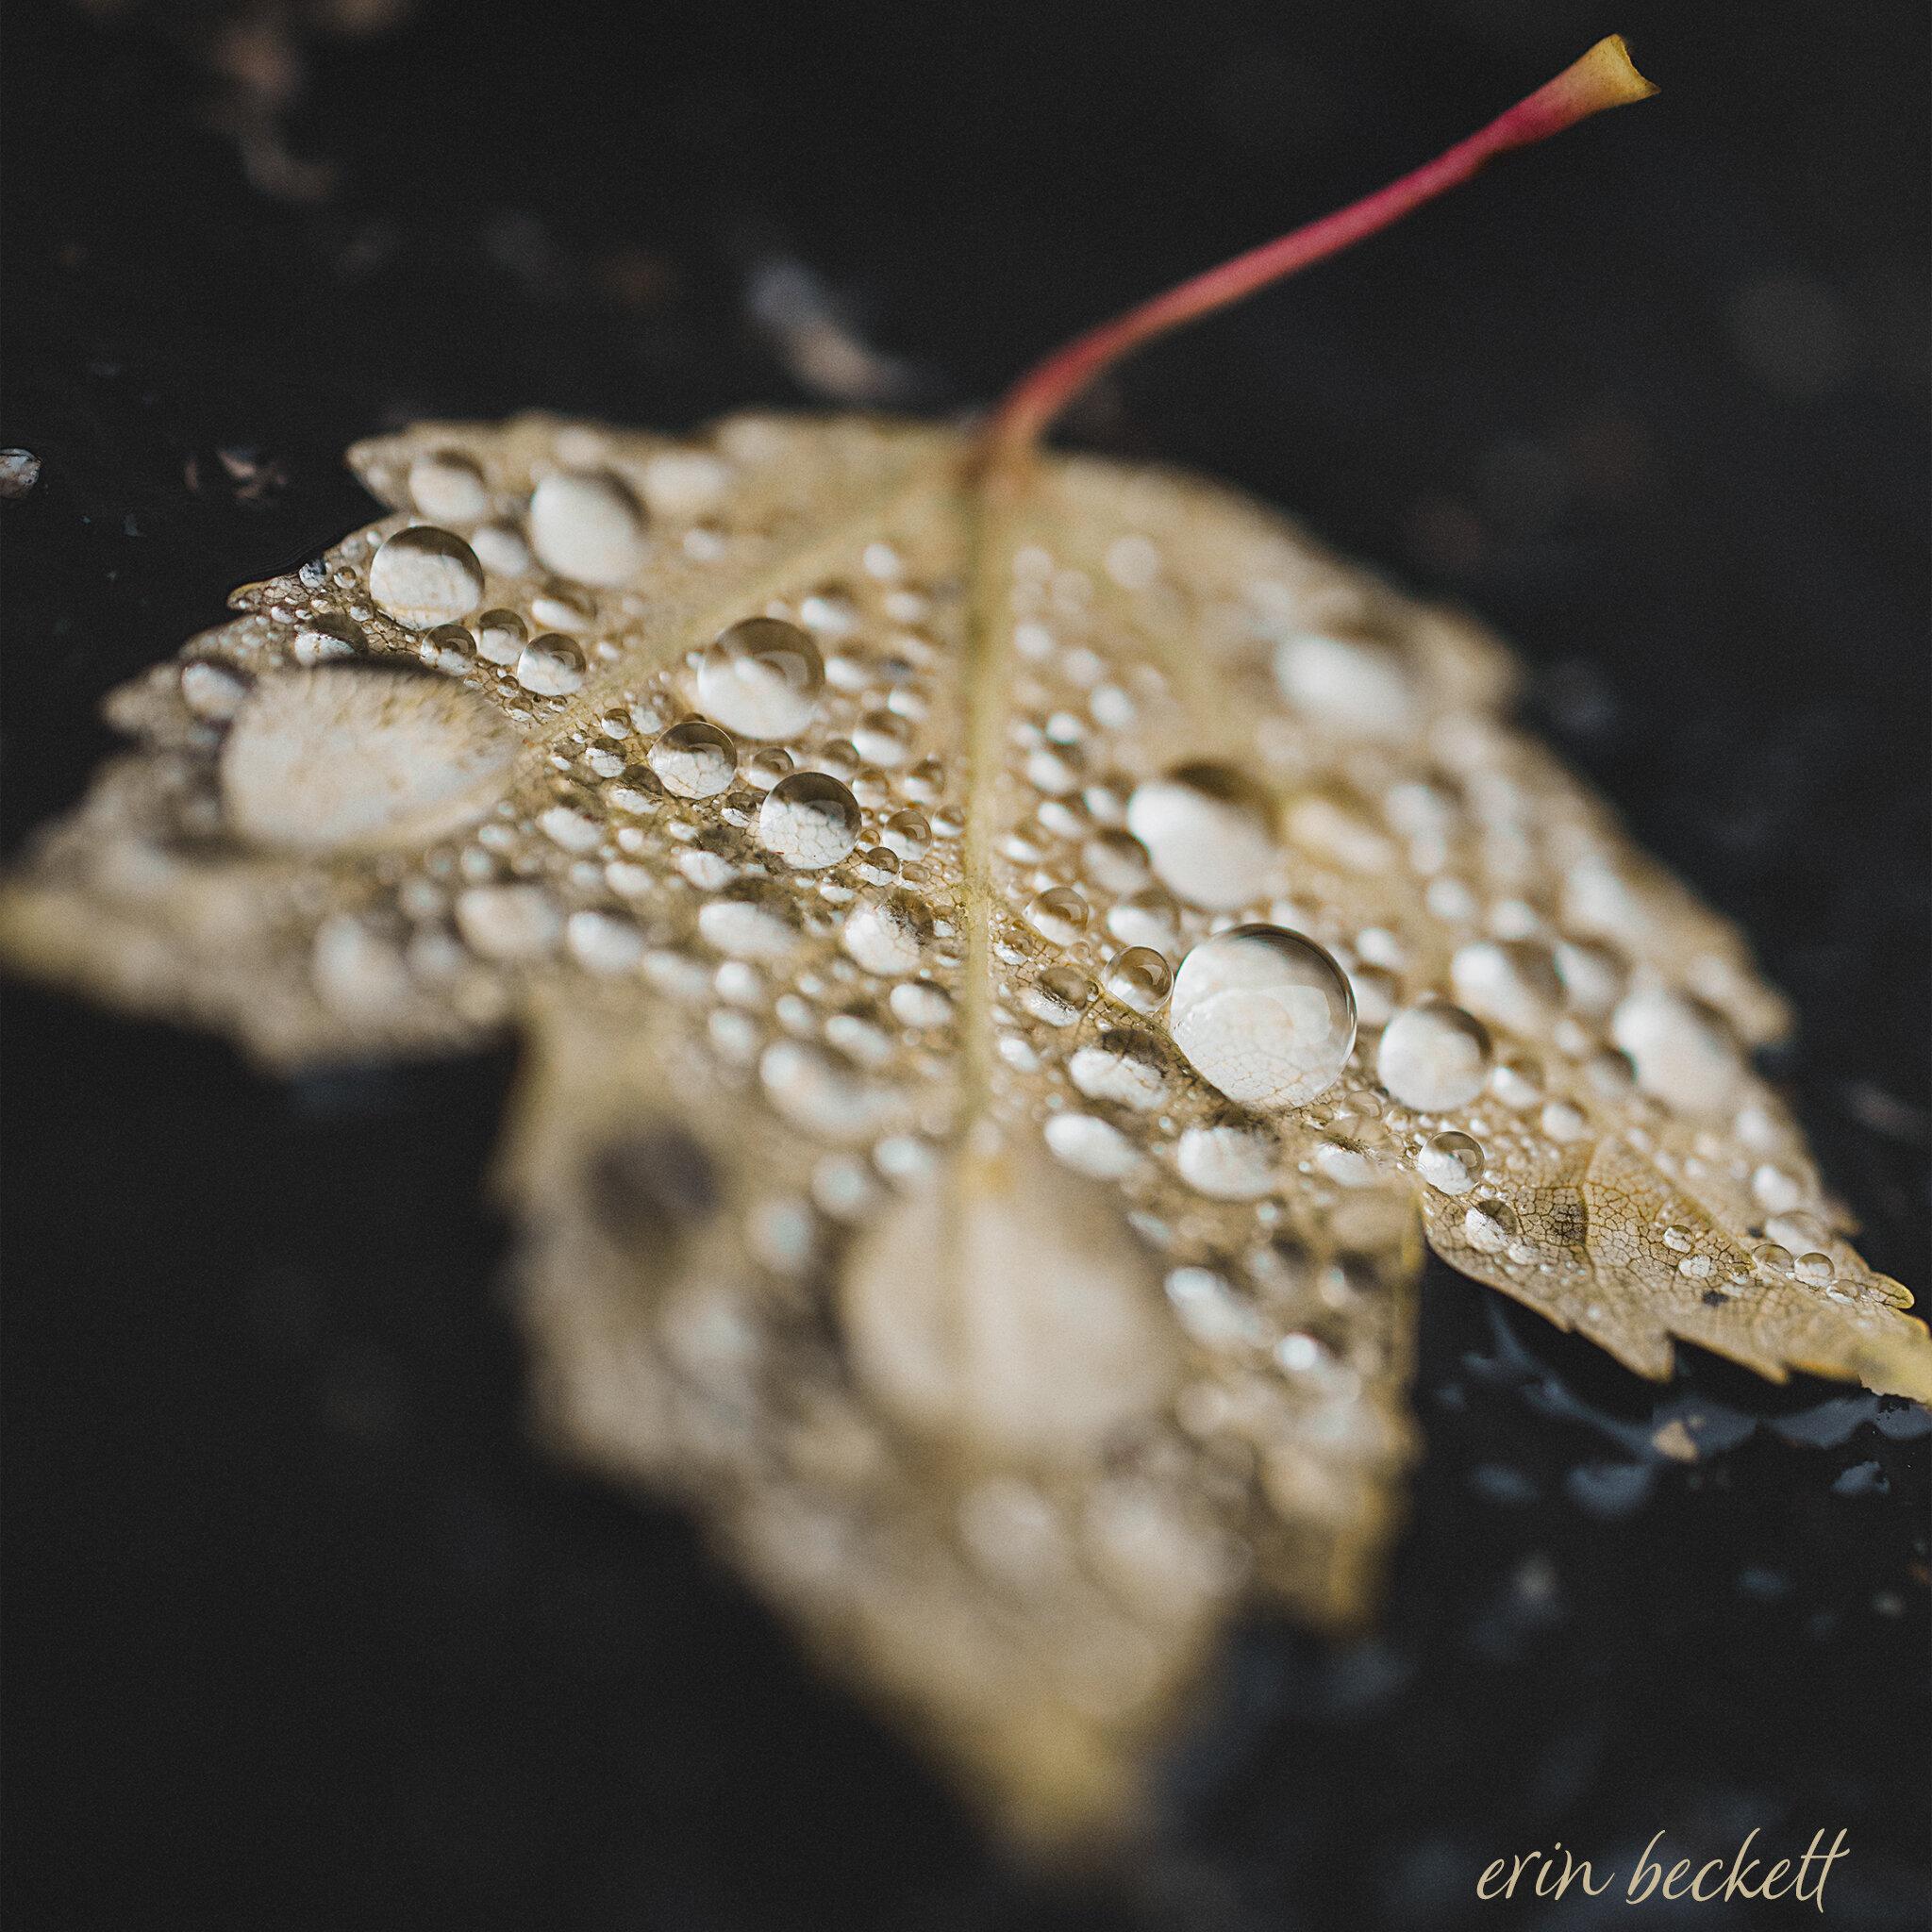 WetLeaf_ErinBeckett_2019-10-03_003.jpg